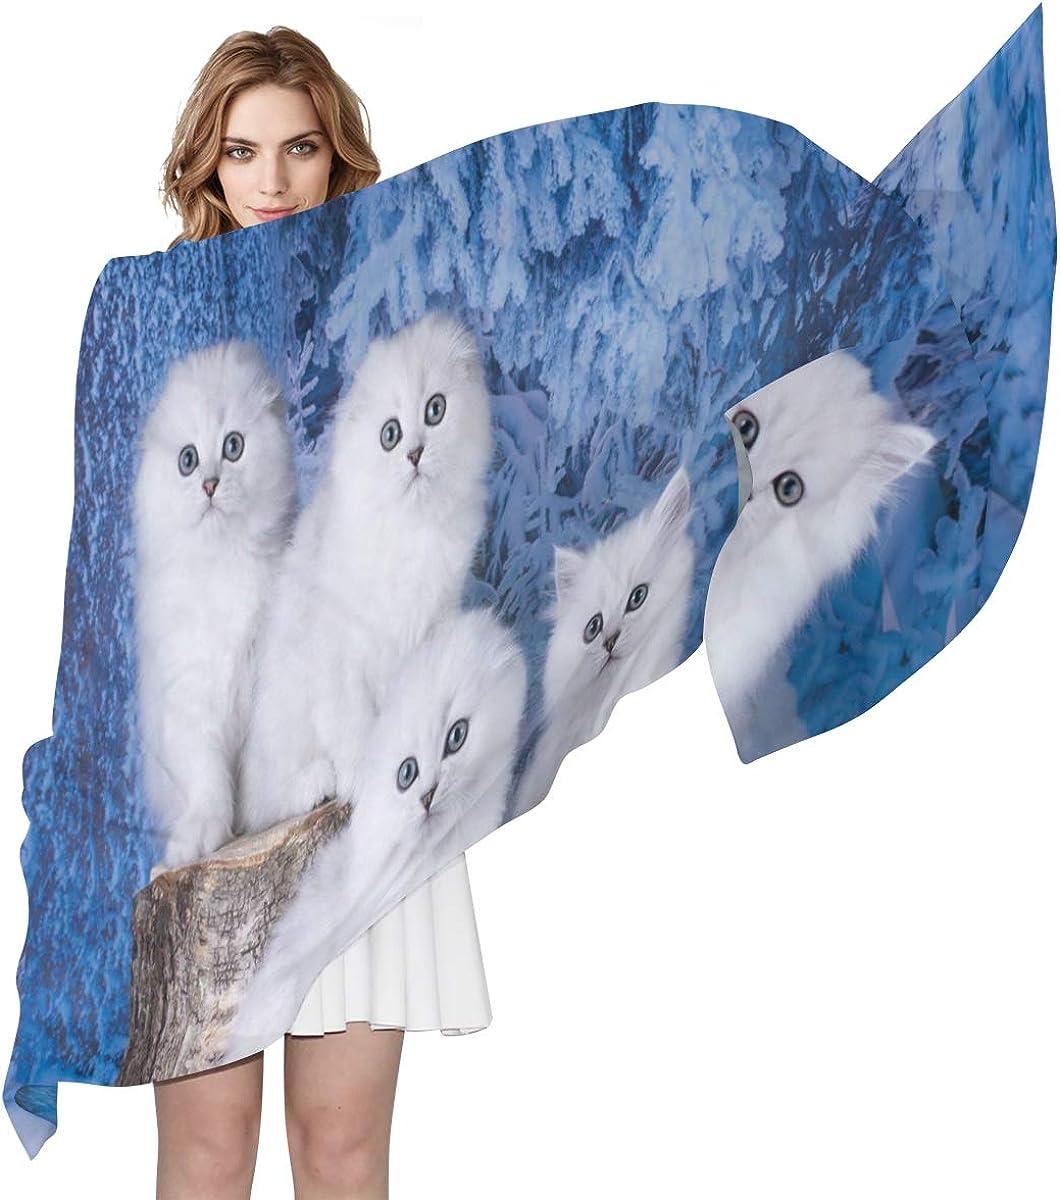 XLING Fashion Scarf Cute Animal Cat Winter Long Lightweight Sunscreen Scarf Shawl Wrap Muffler Neckerchief for Women Men